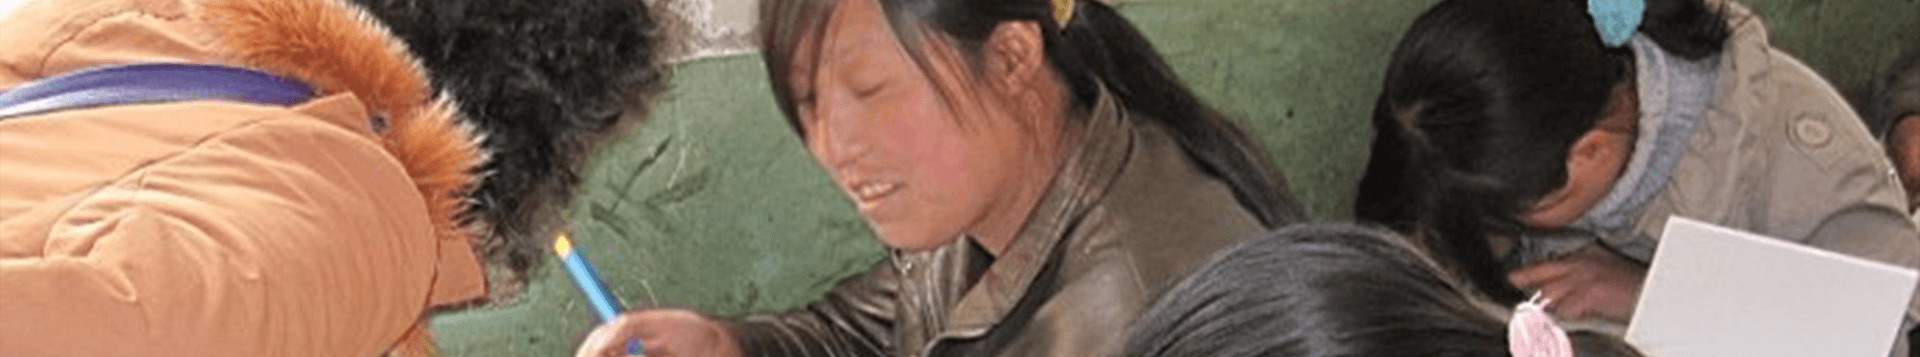 ProLiteracy International Program, China